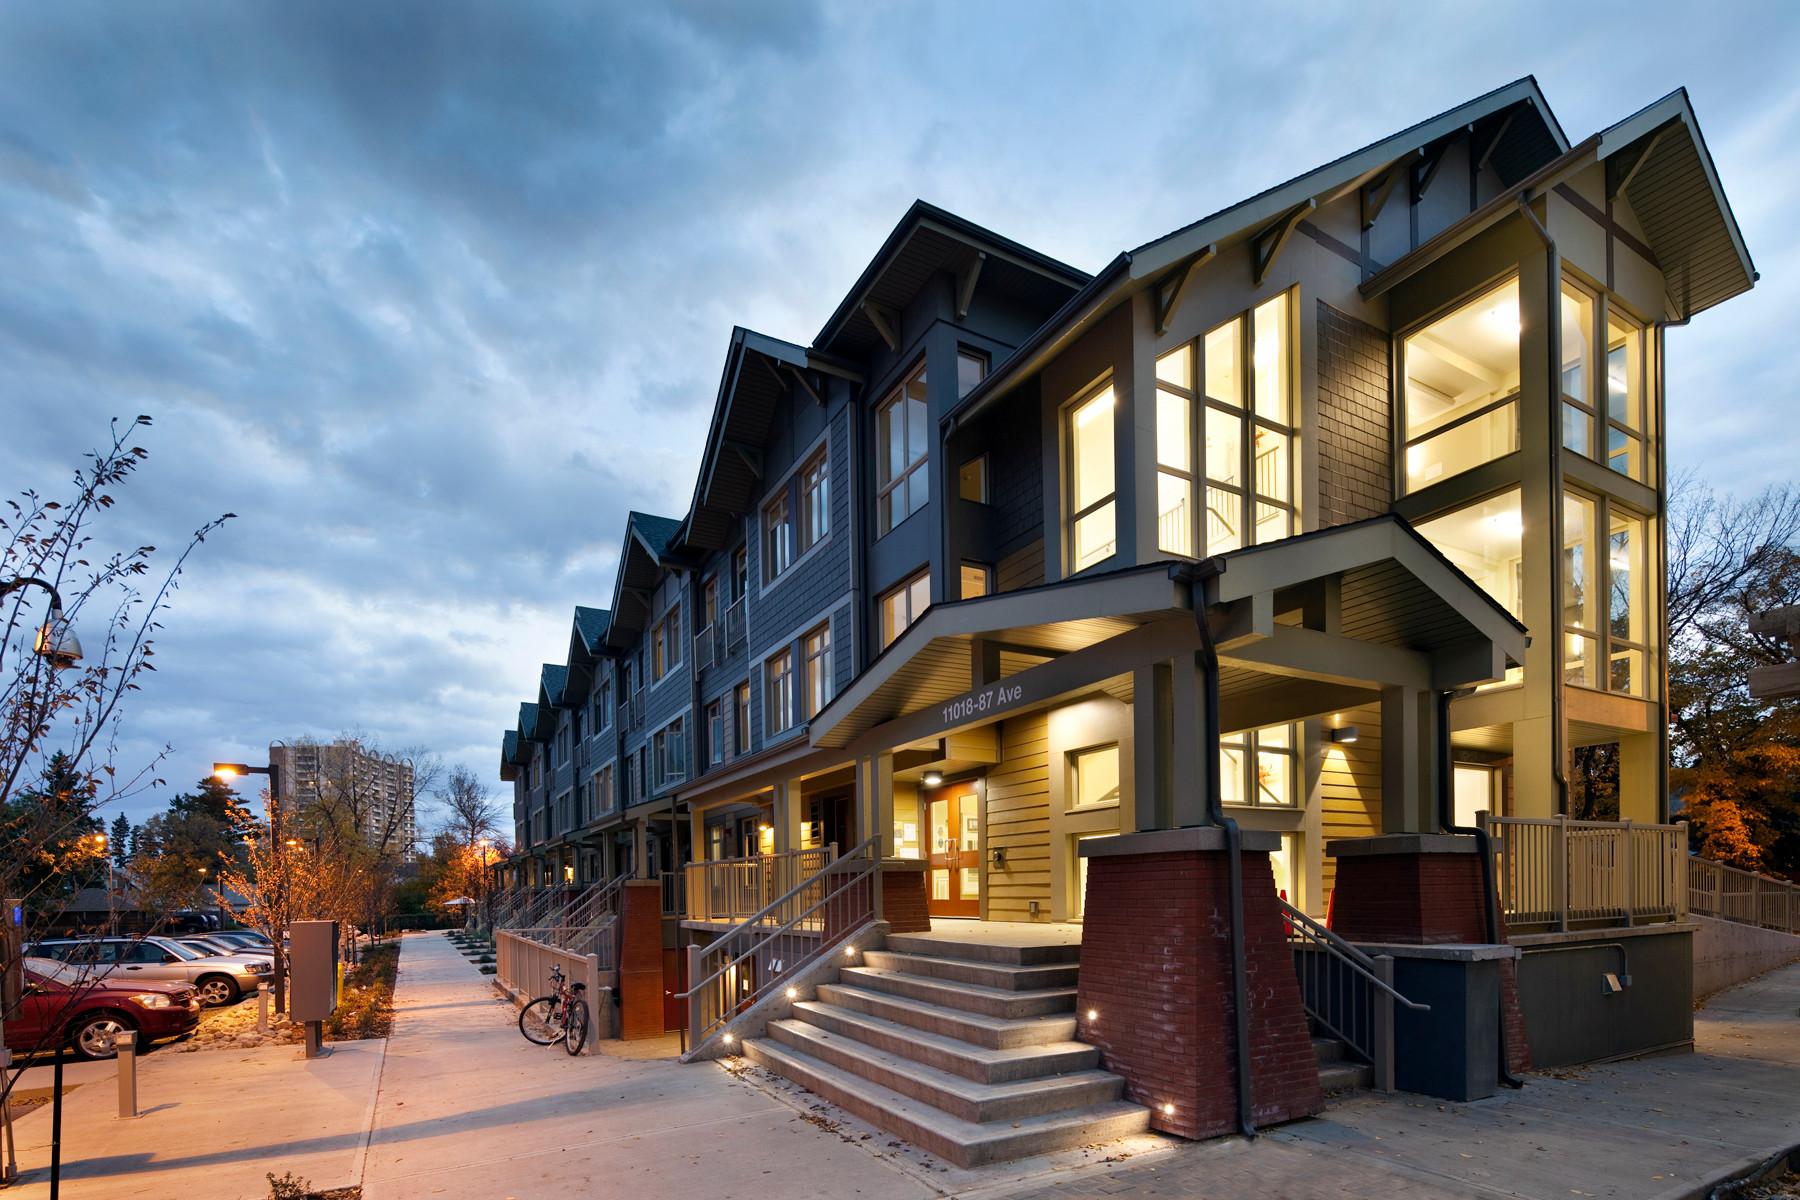 U of A East Campus Village - Graduate Housing